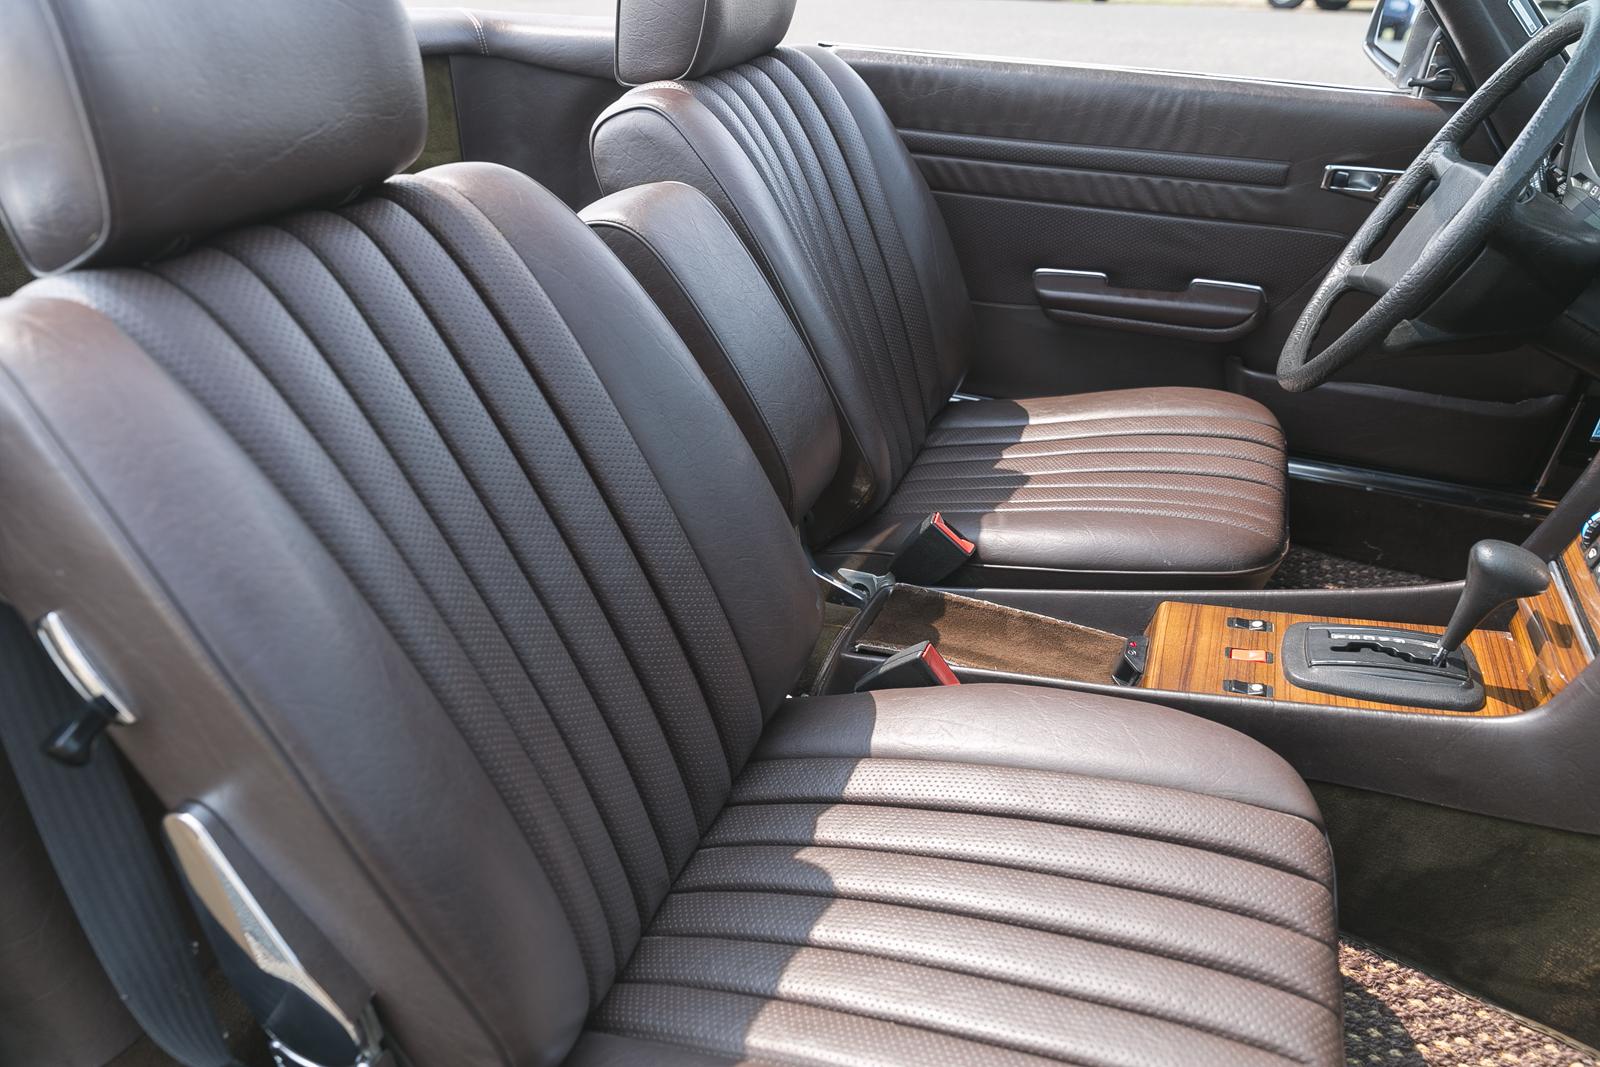 1982 Mercedes-Benz 380SL for sale